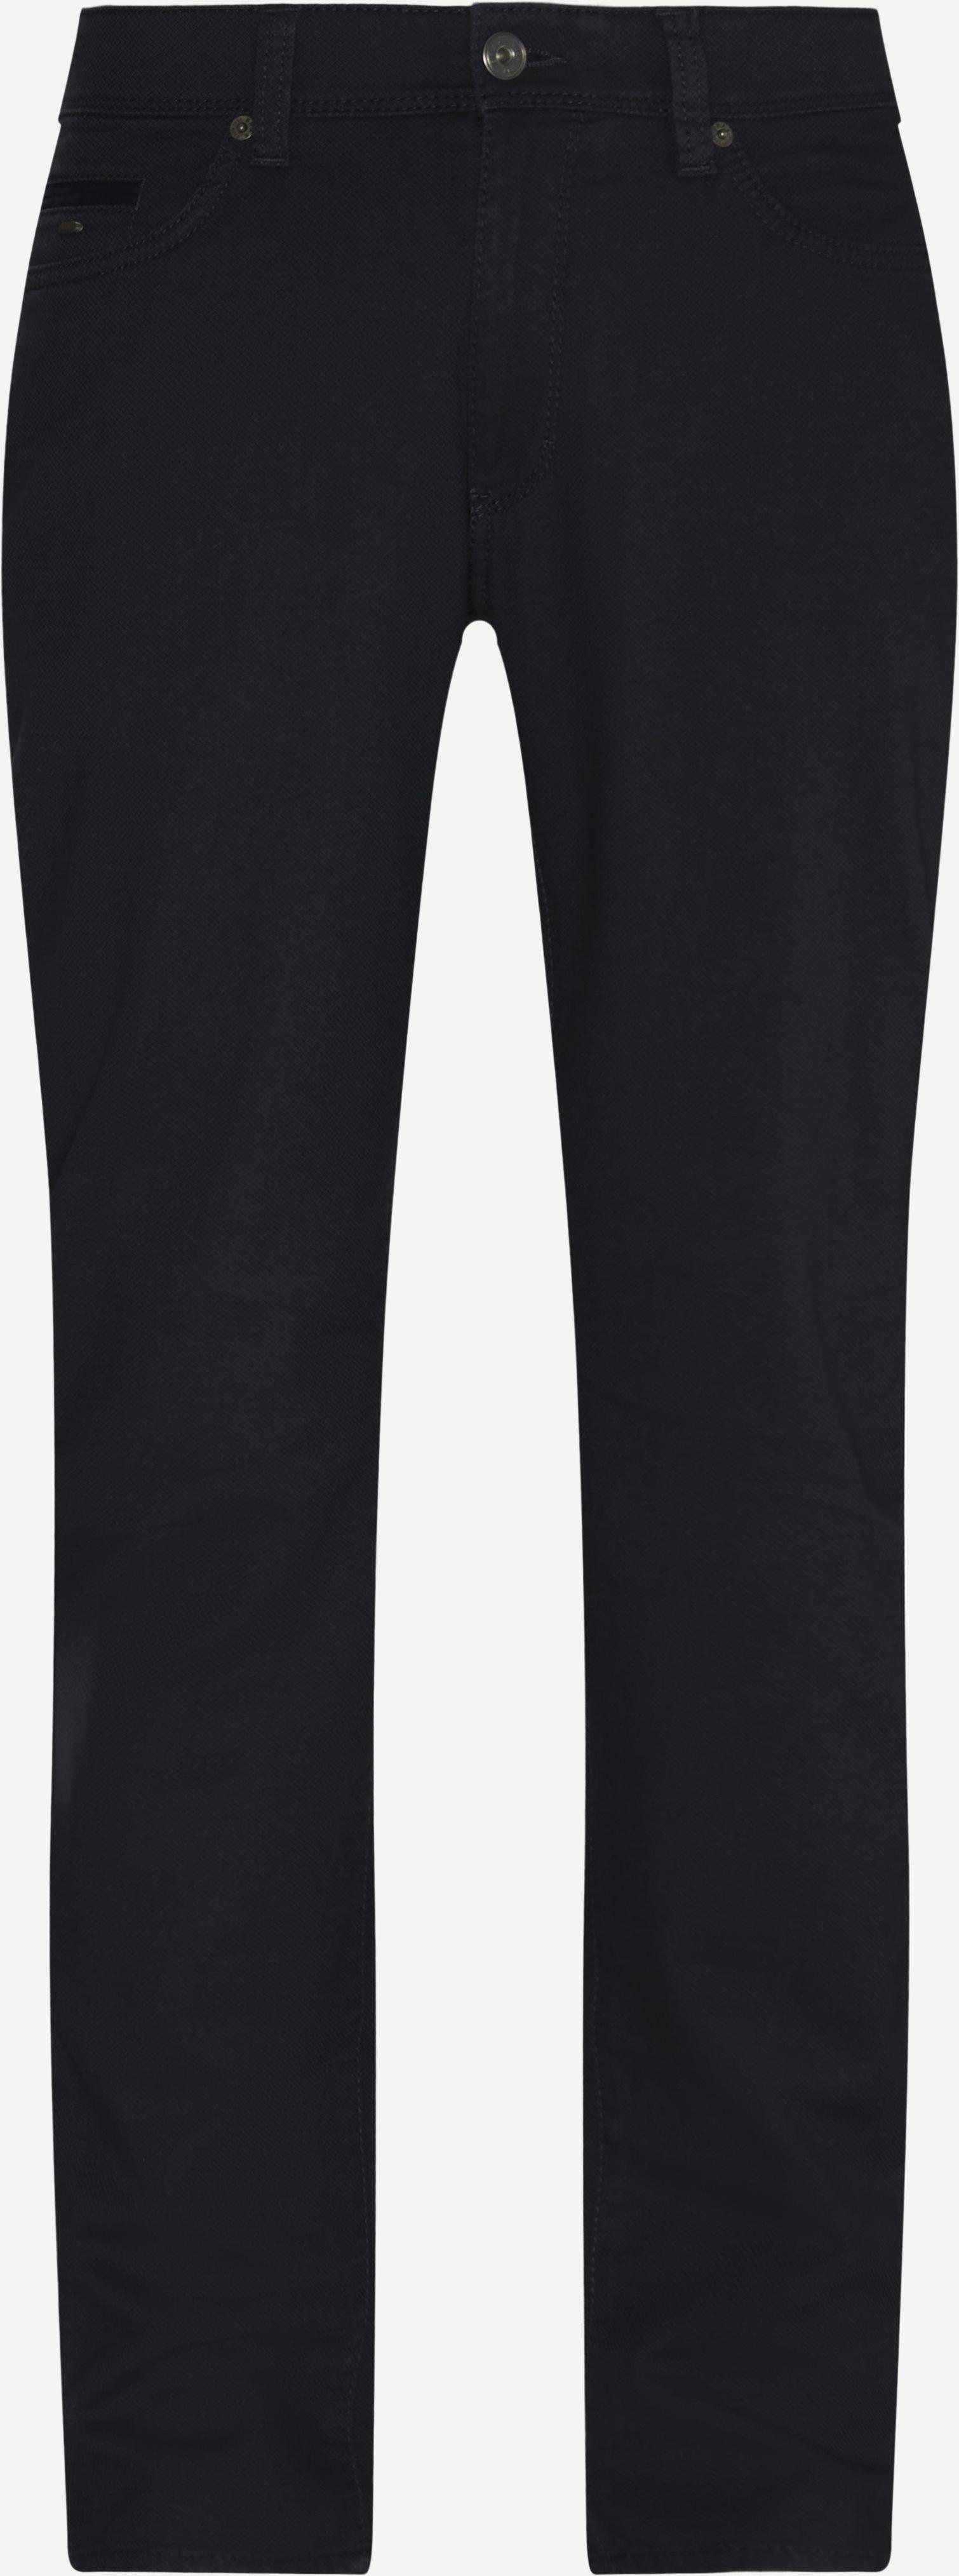 Jeans - Straight fit - Jeans-Blau